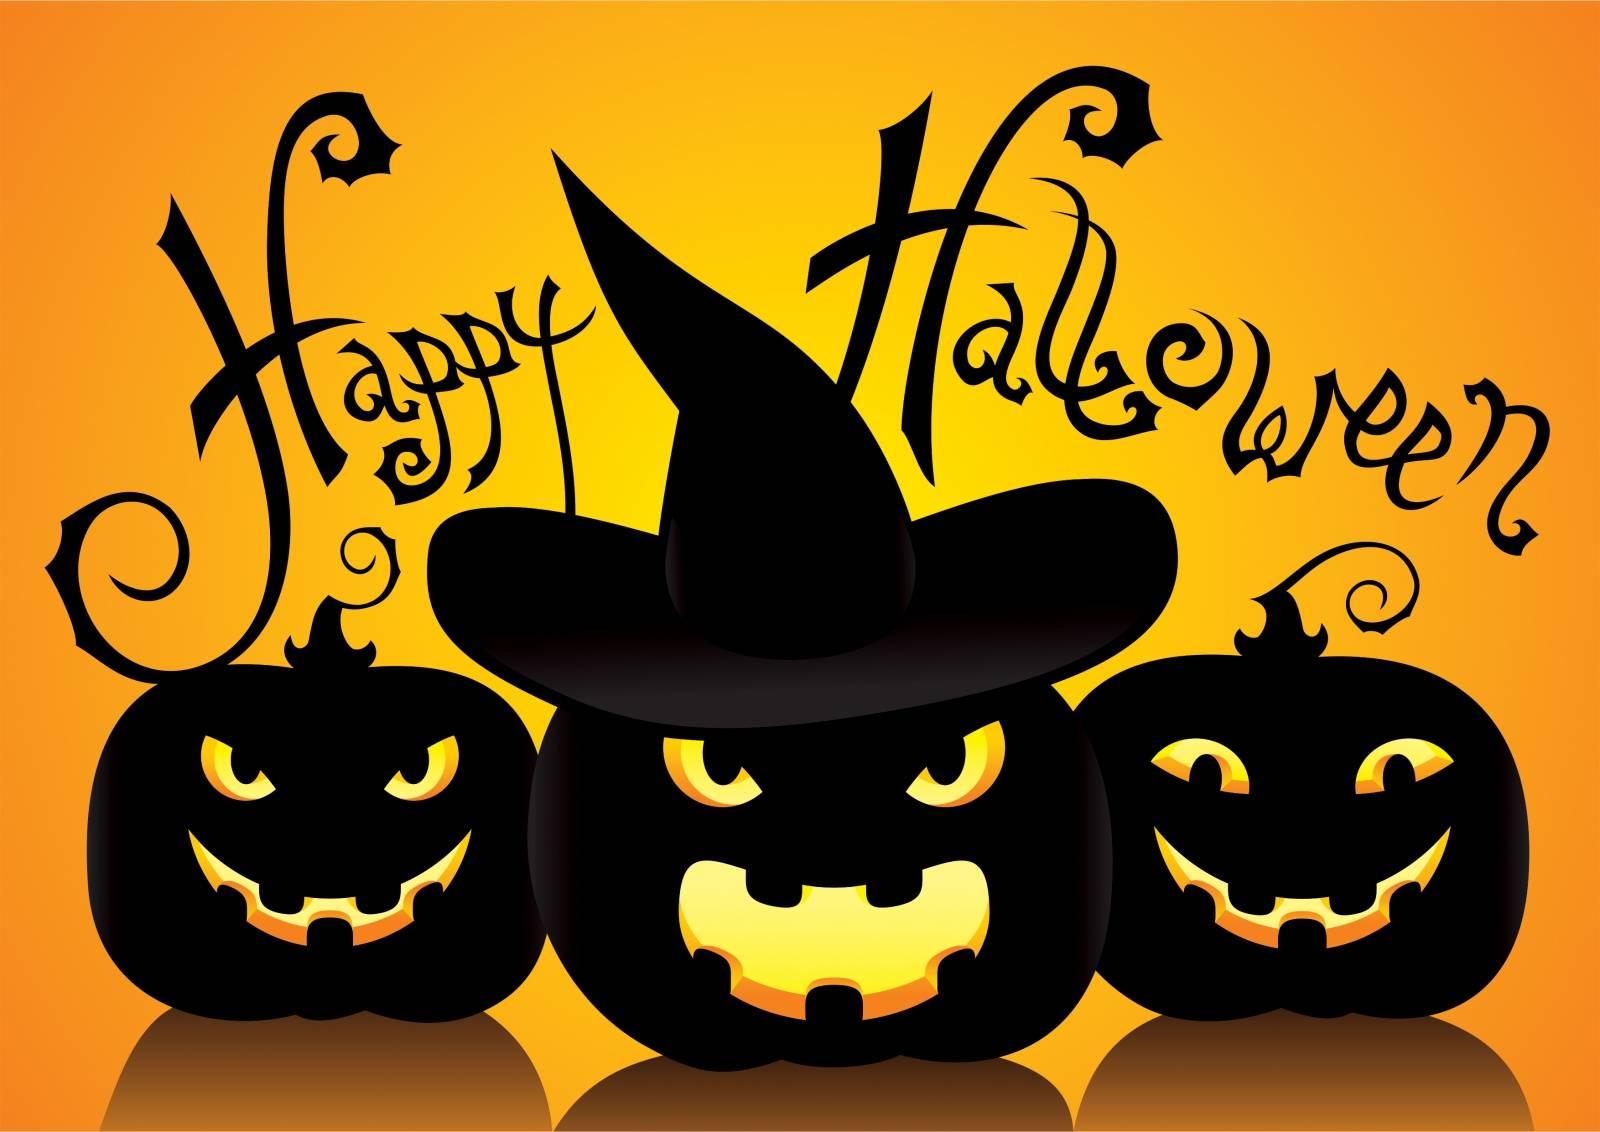 Kde slavit Halloween: 5 tipů redakce iREPORTu